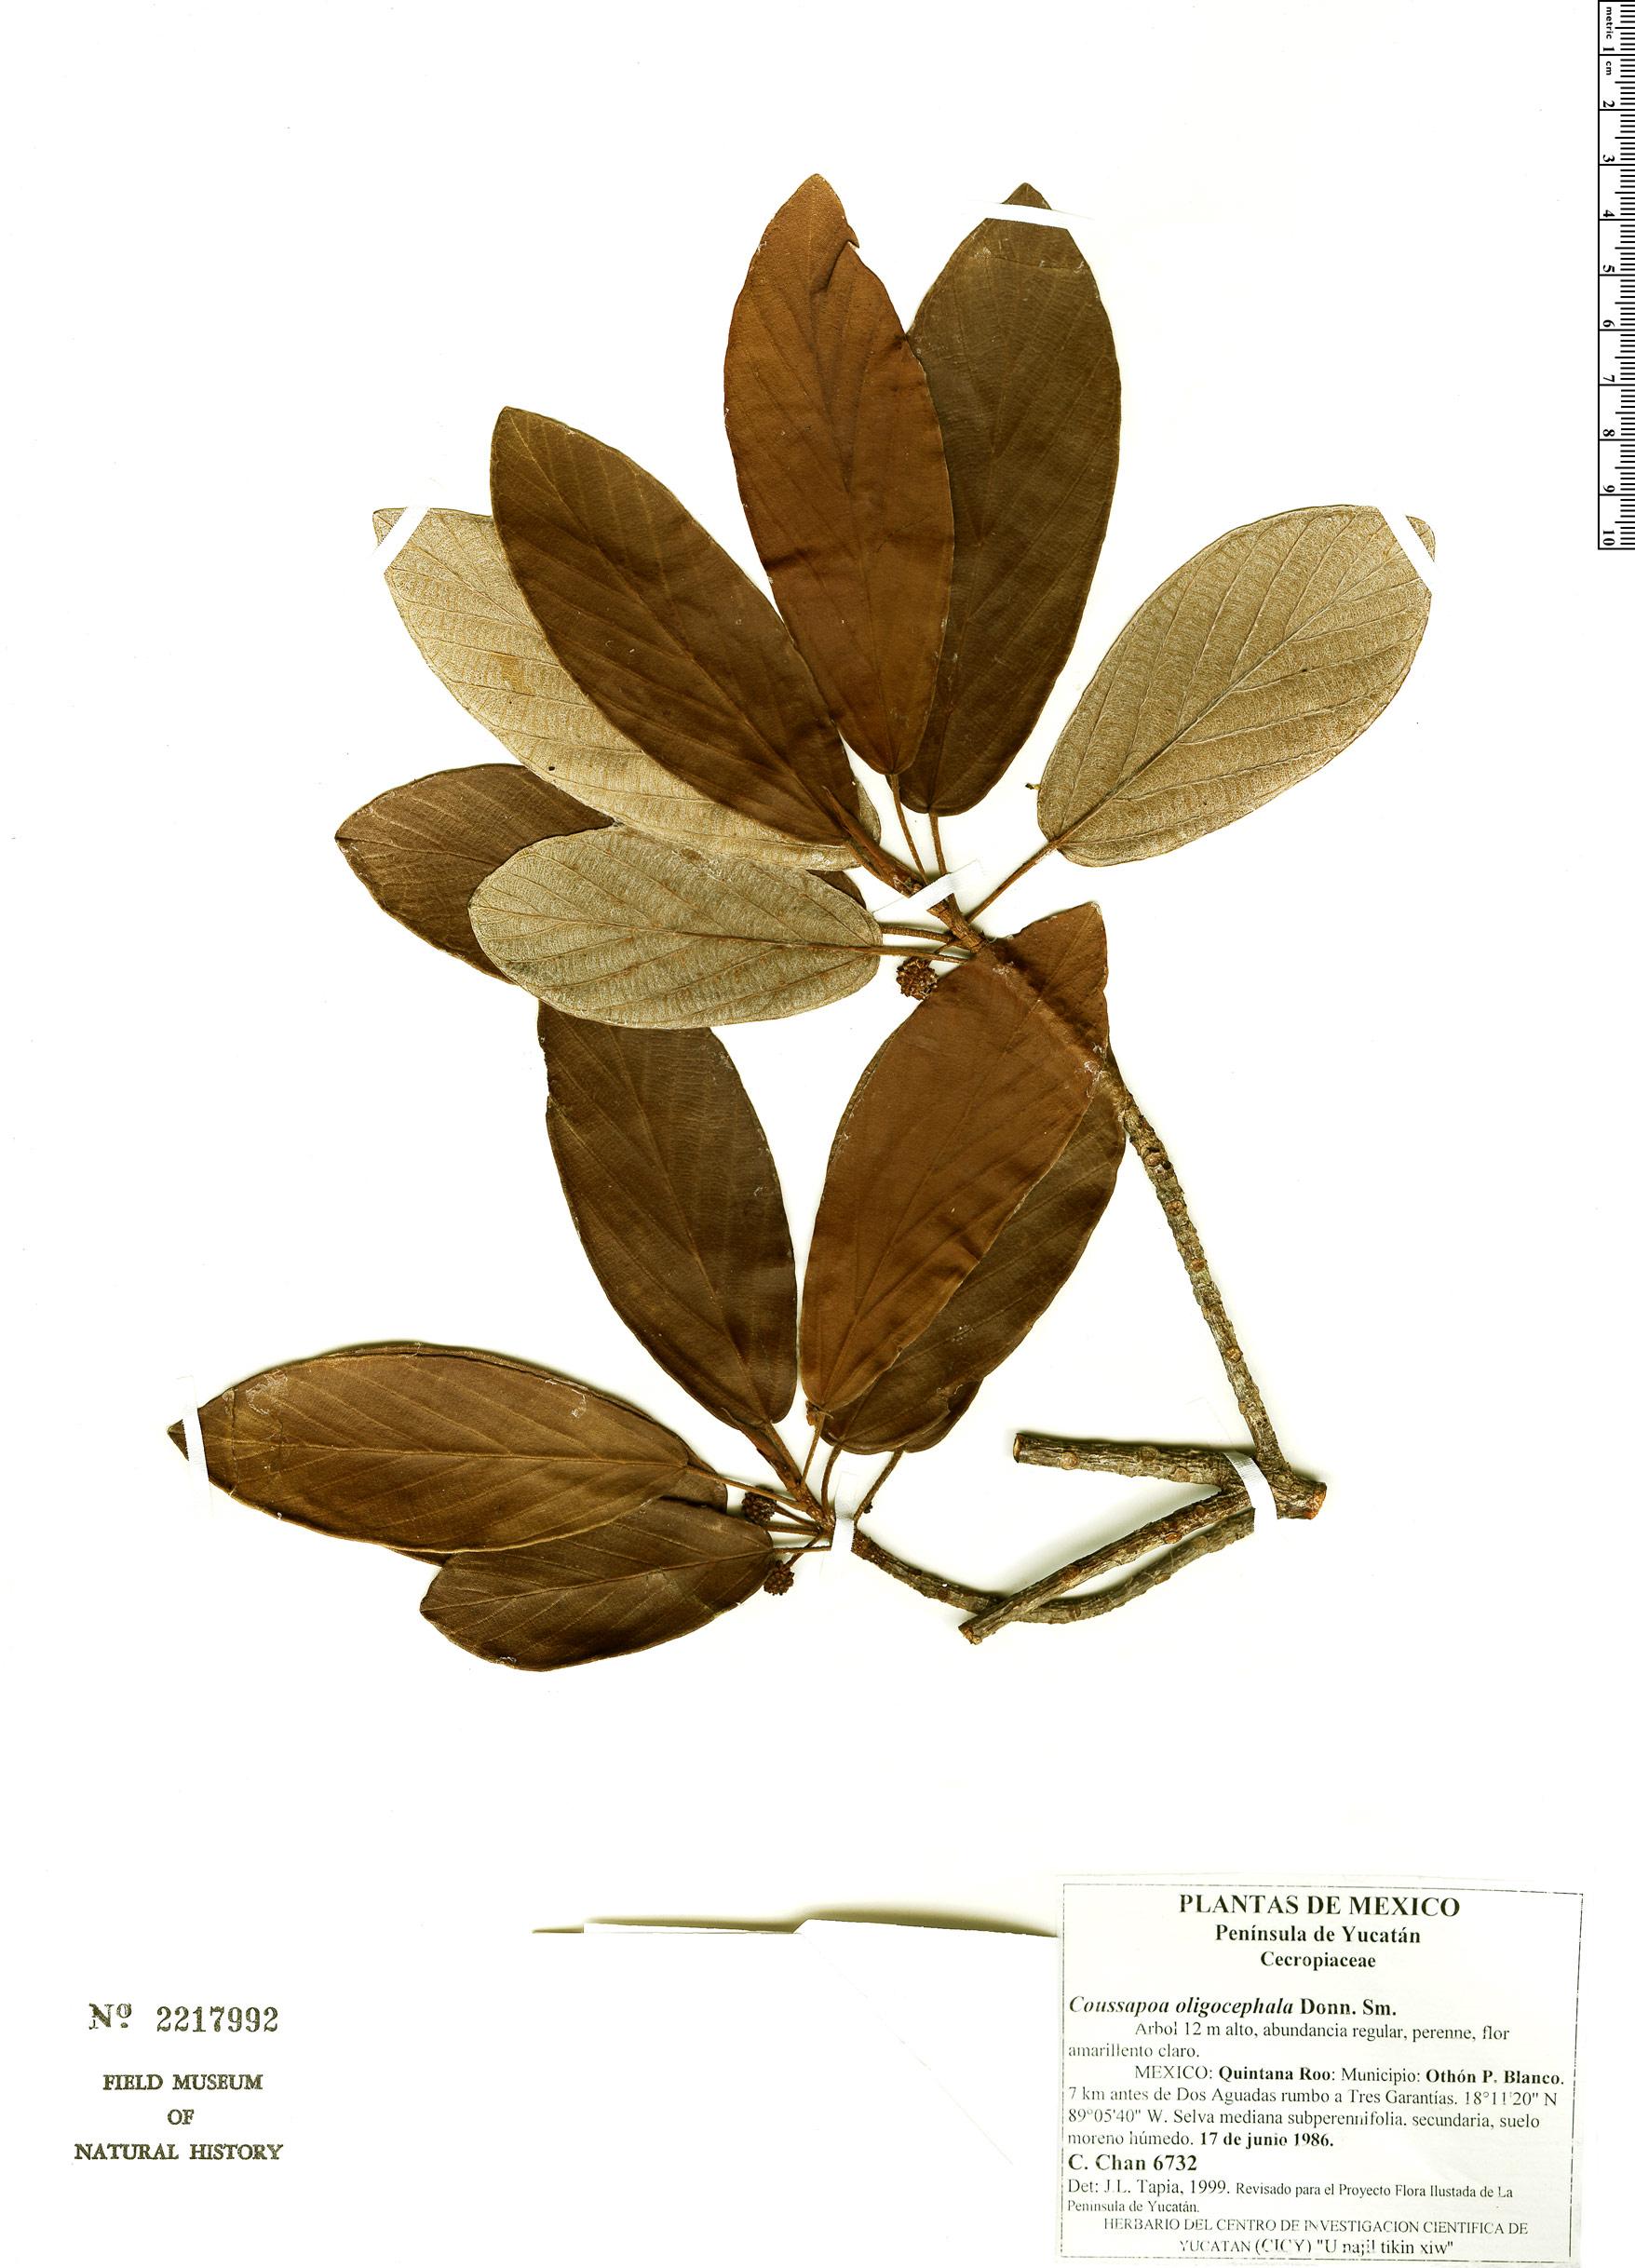 Espécime: Coussapoa oligocephala